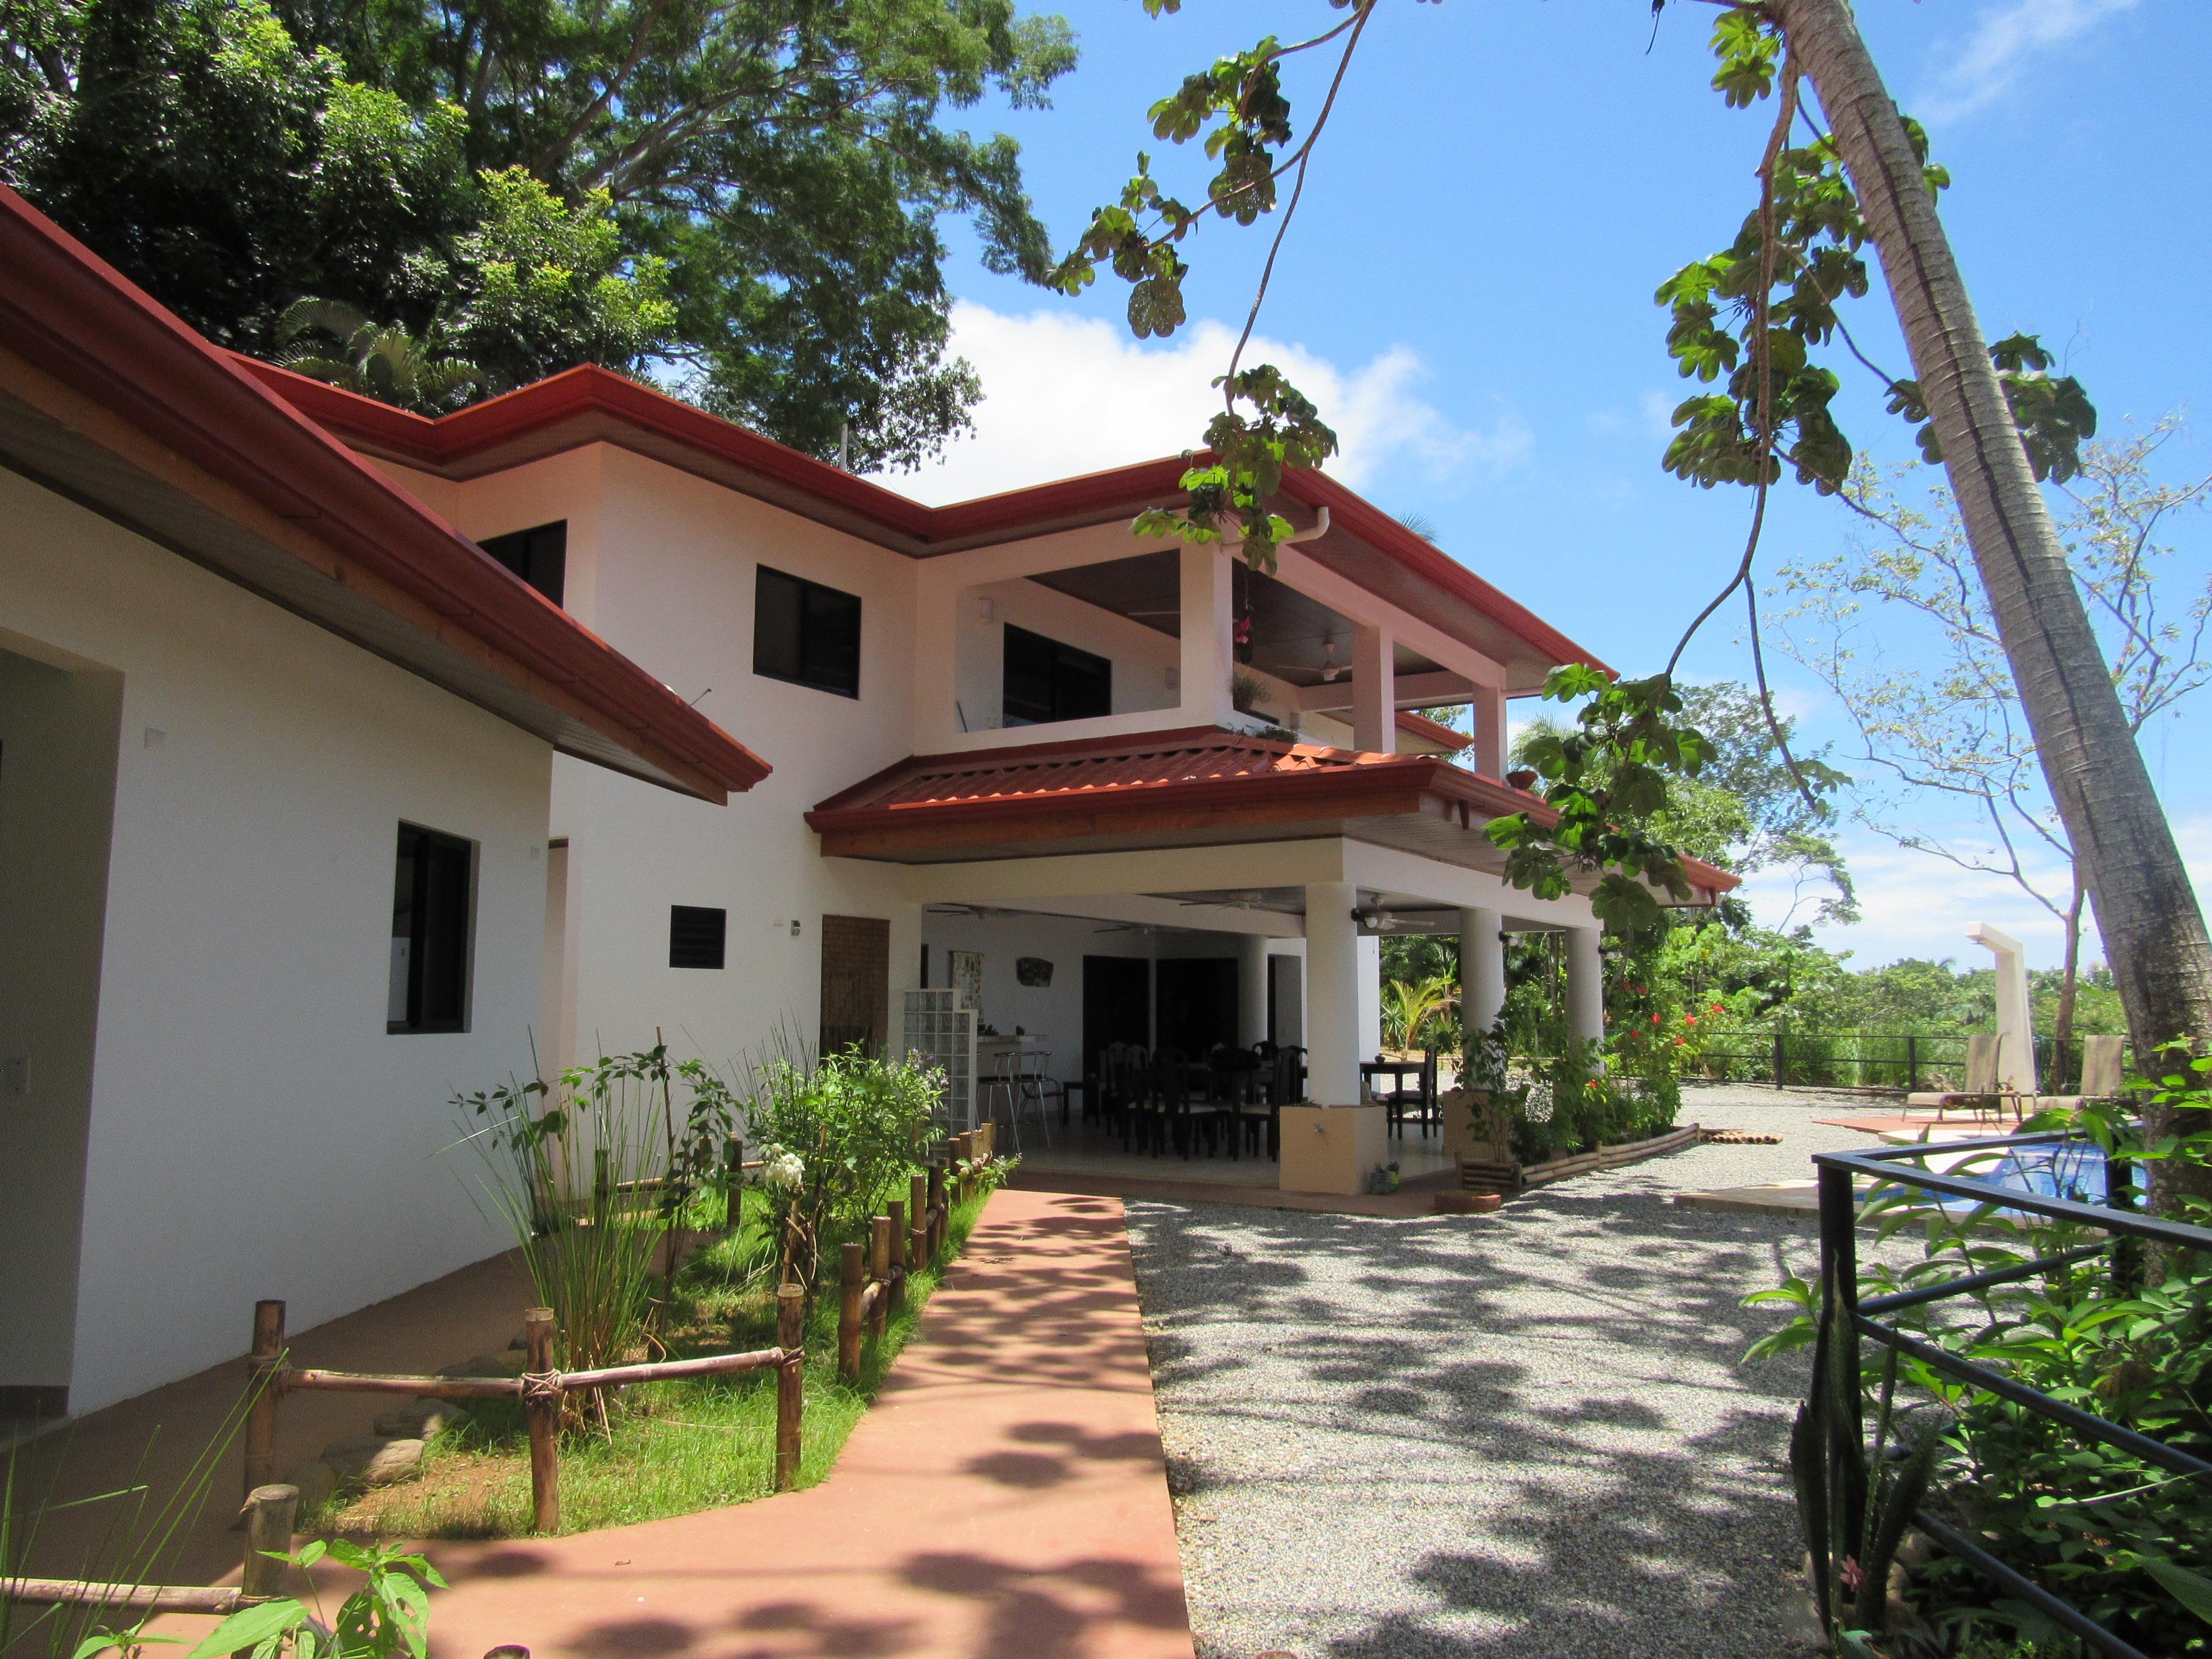 Hatillo-Costa-Rica-property-costaricarealestateHAT087.jpg